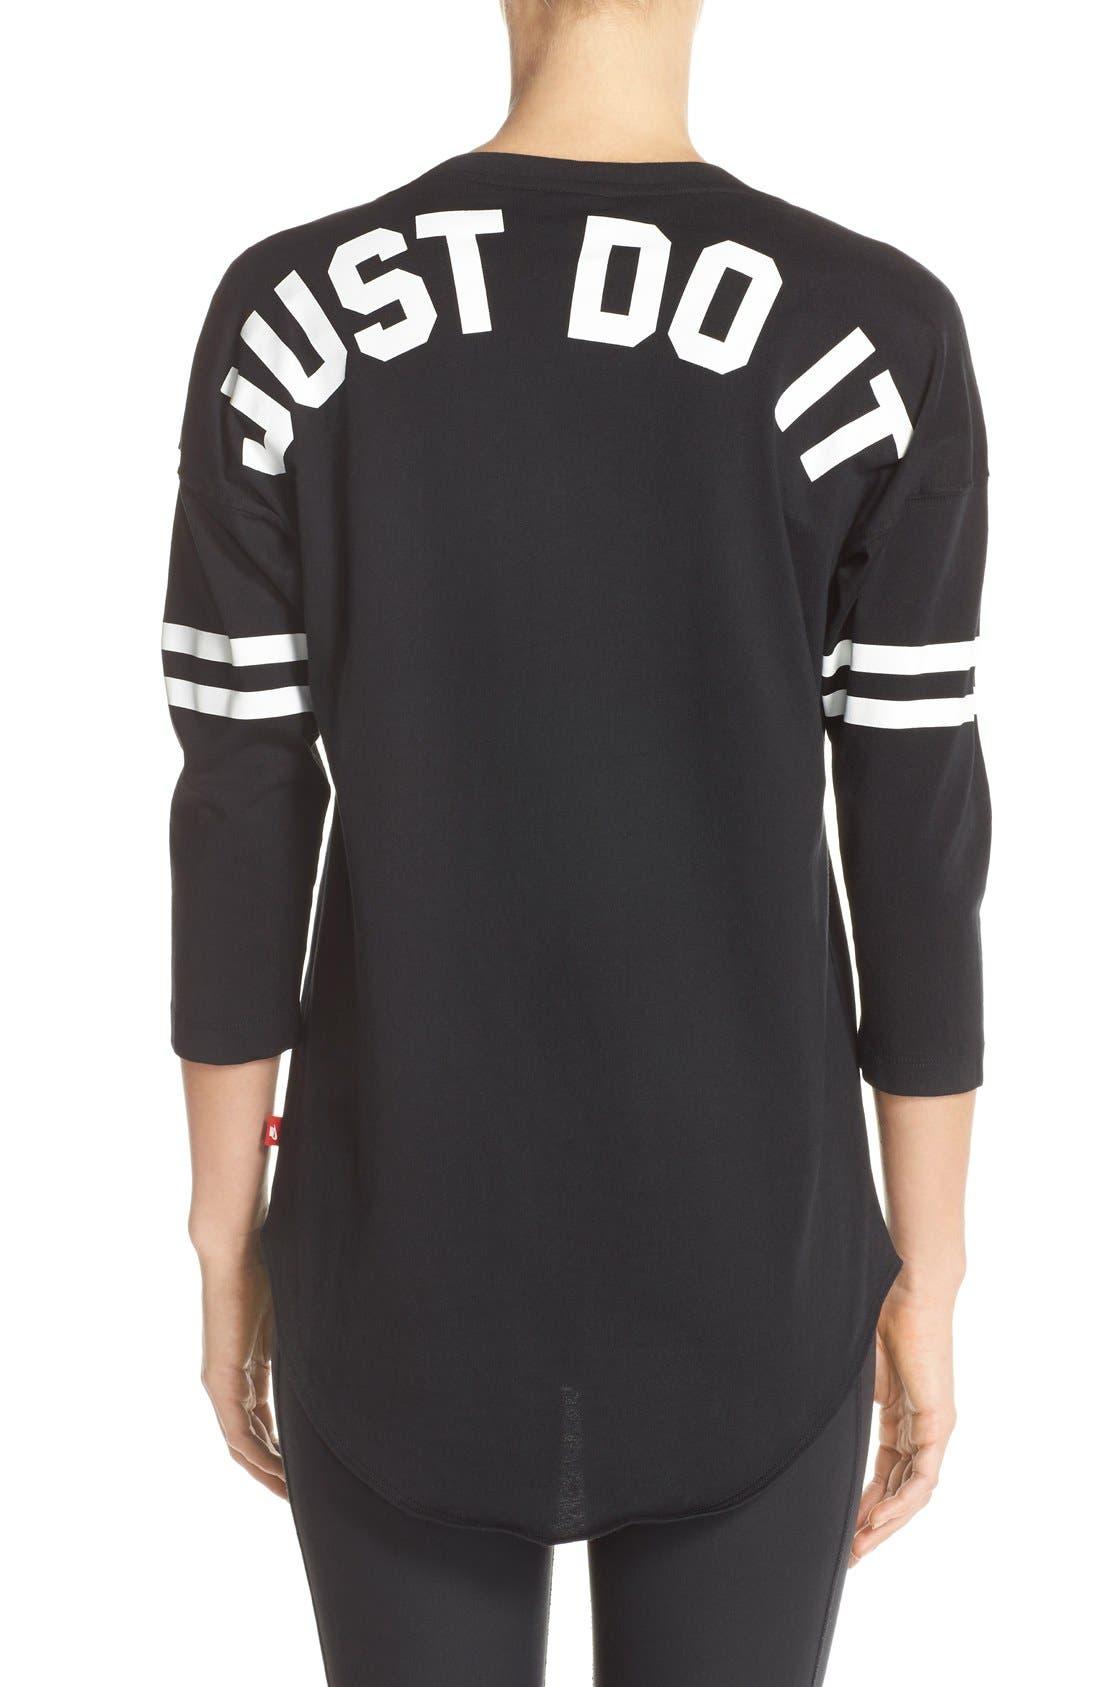 Alternate Image 2  - Nike 'Just Do It Spirit' Top